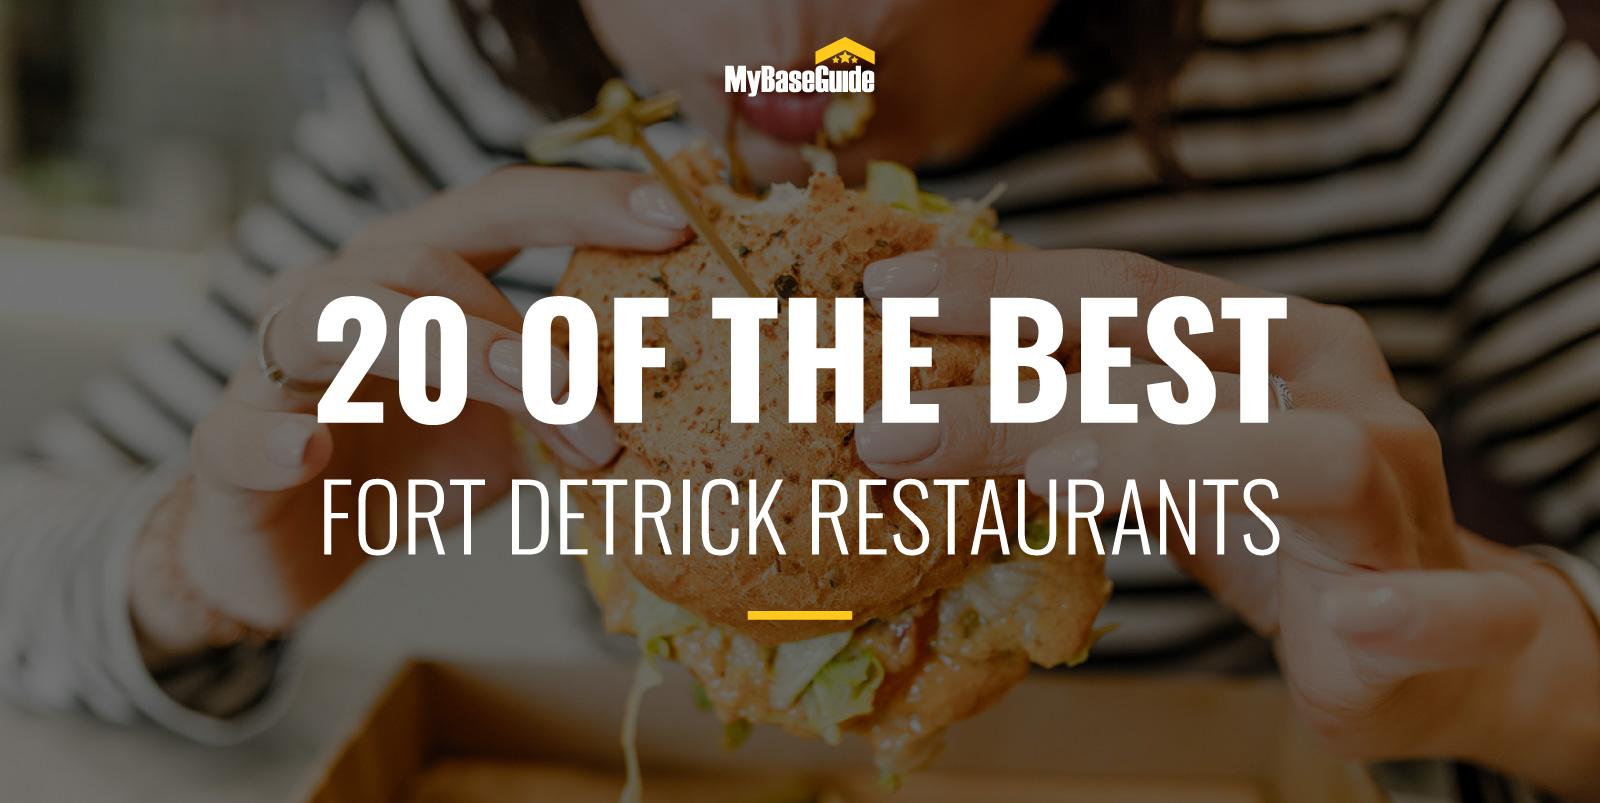 20 of the Best Fort Detrick Restaurants